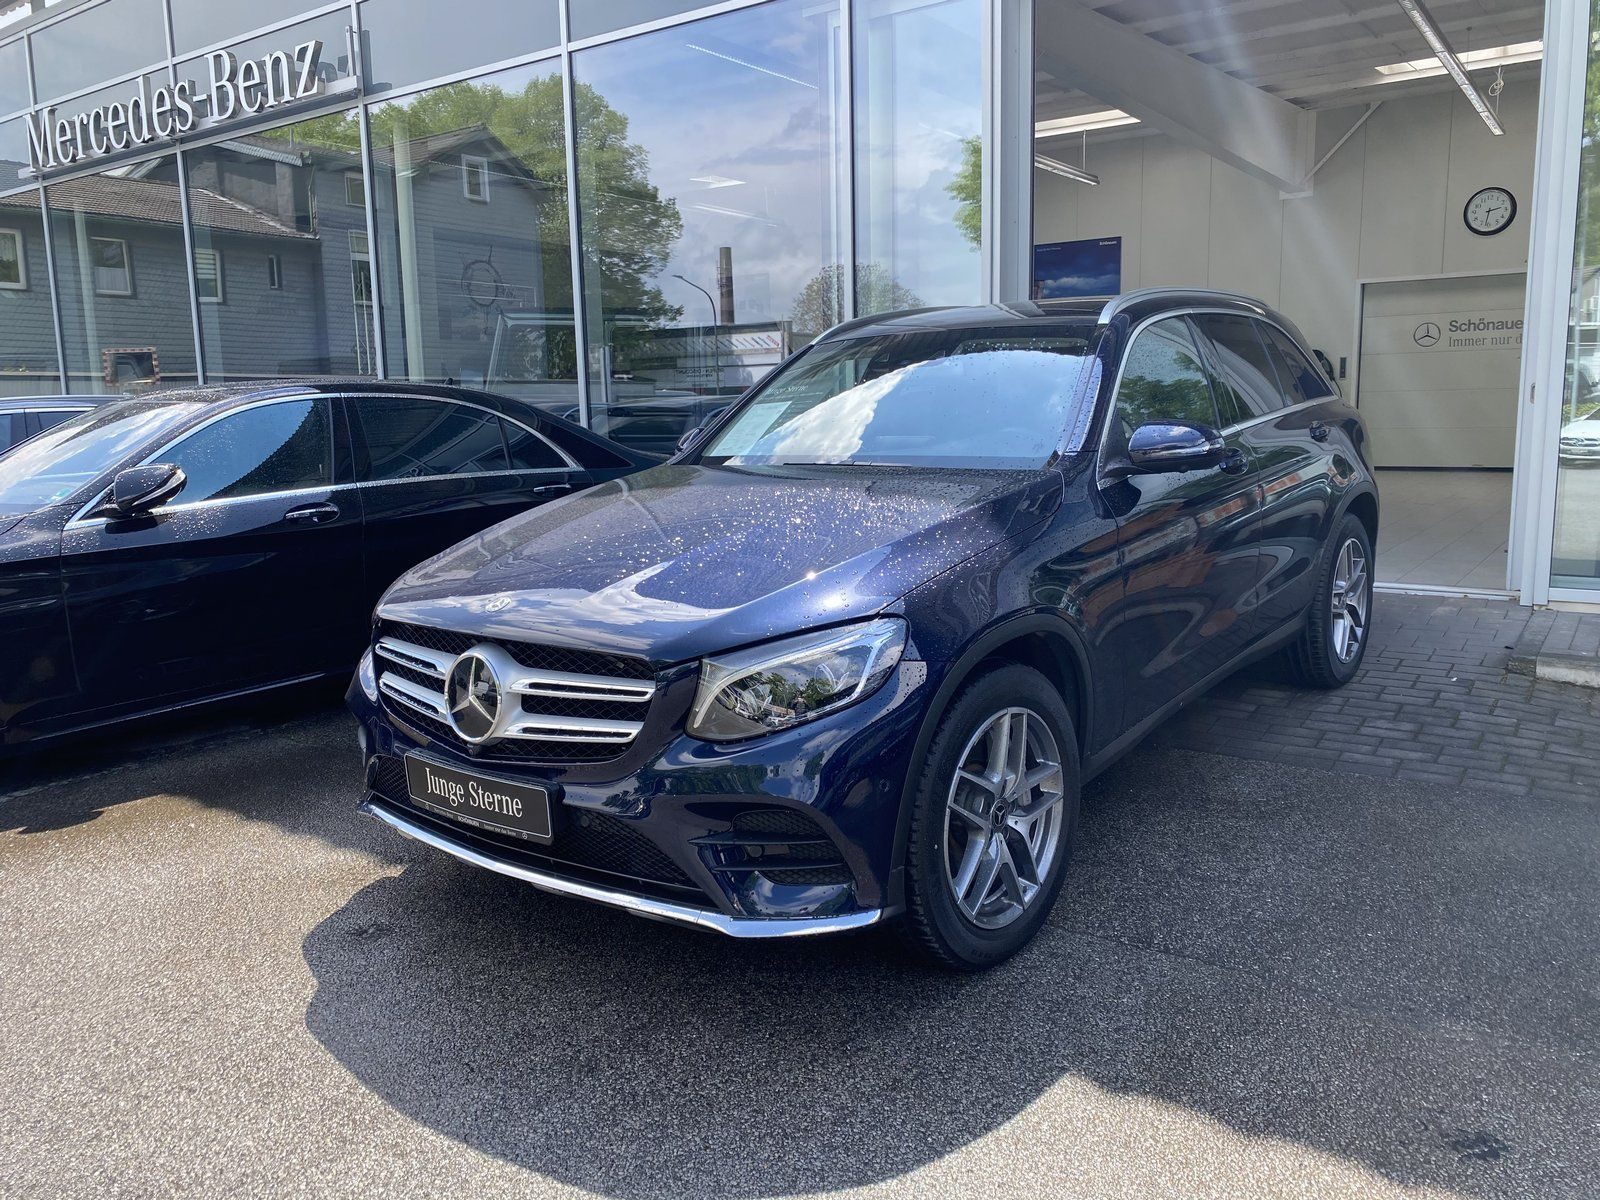 Mercedes-Benz GLC 250 4M AMG+COMAND+AIRBODY+DISTR+PANO+BURMES., Jahr 2018, Benzin